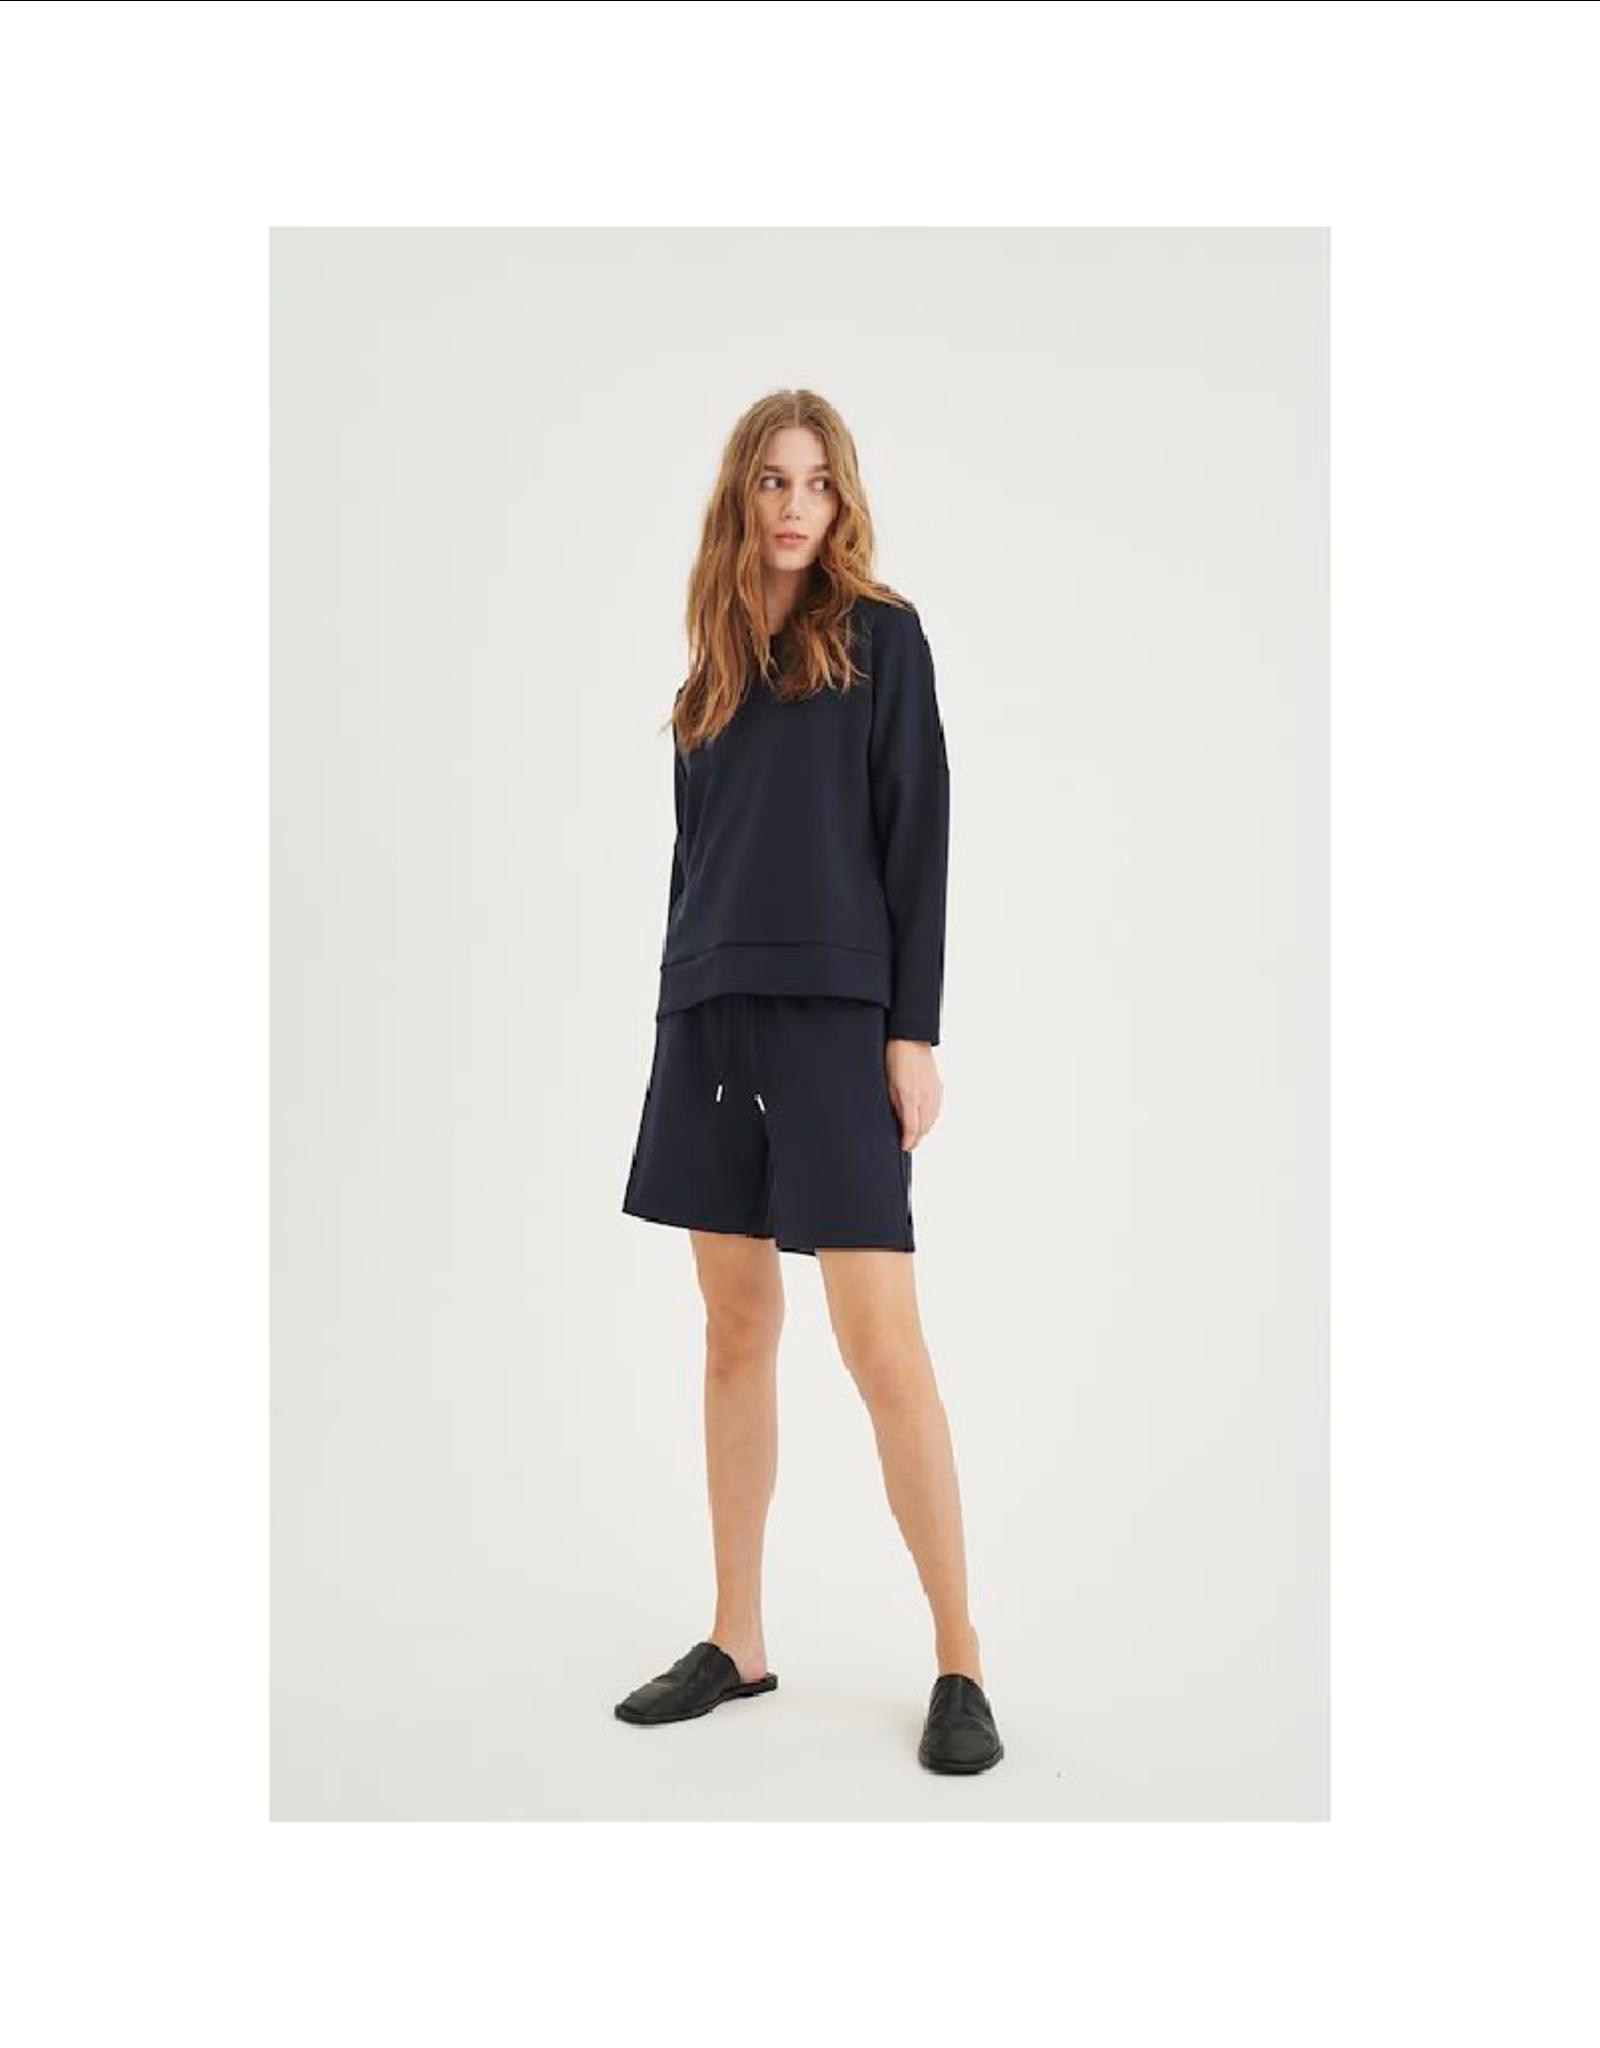 Inwear Soft Drop Shoulder Sweatshirt